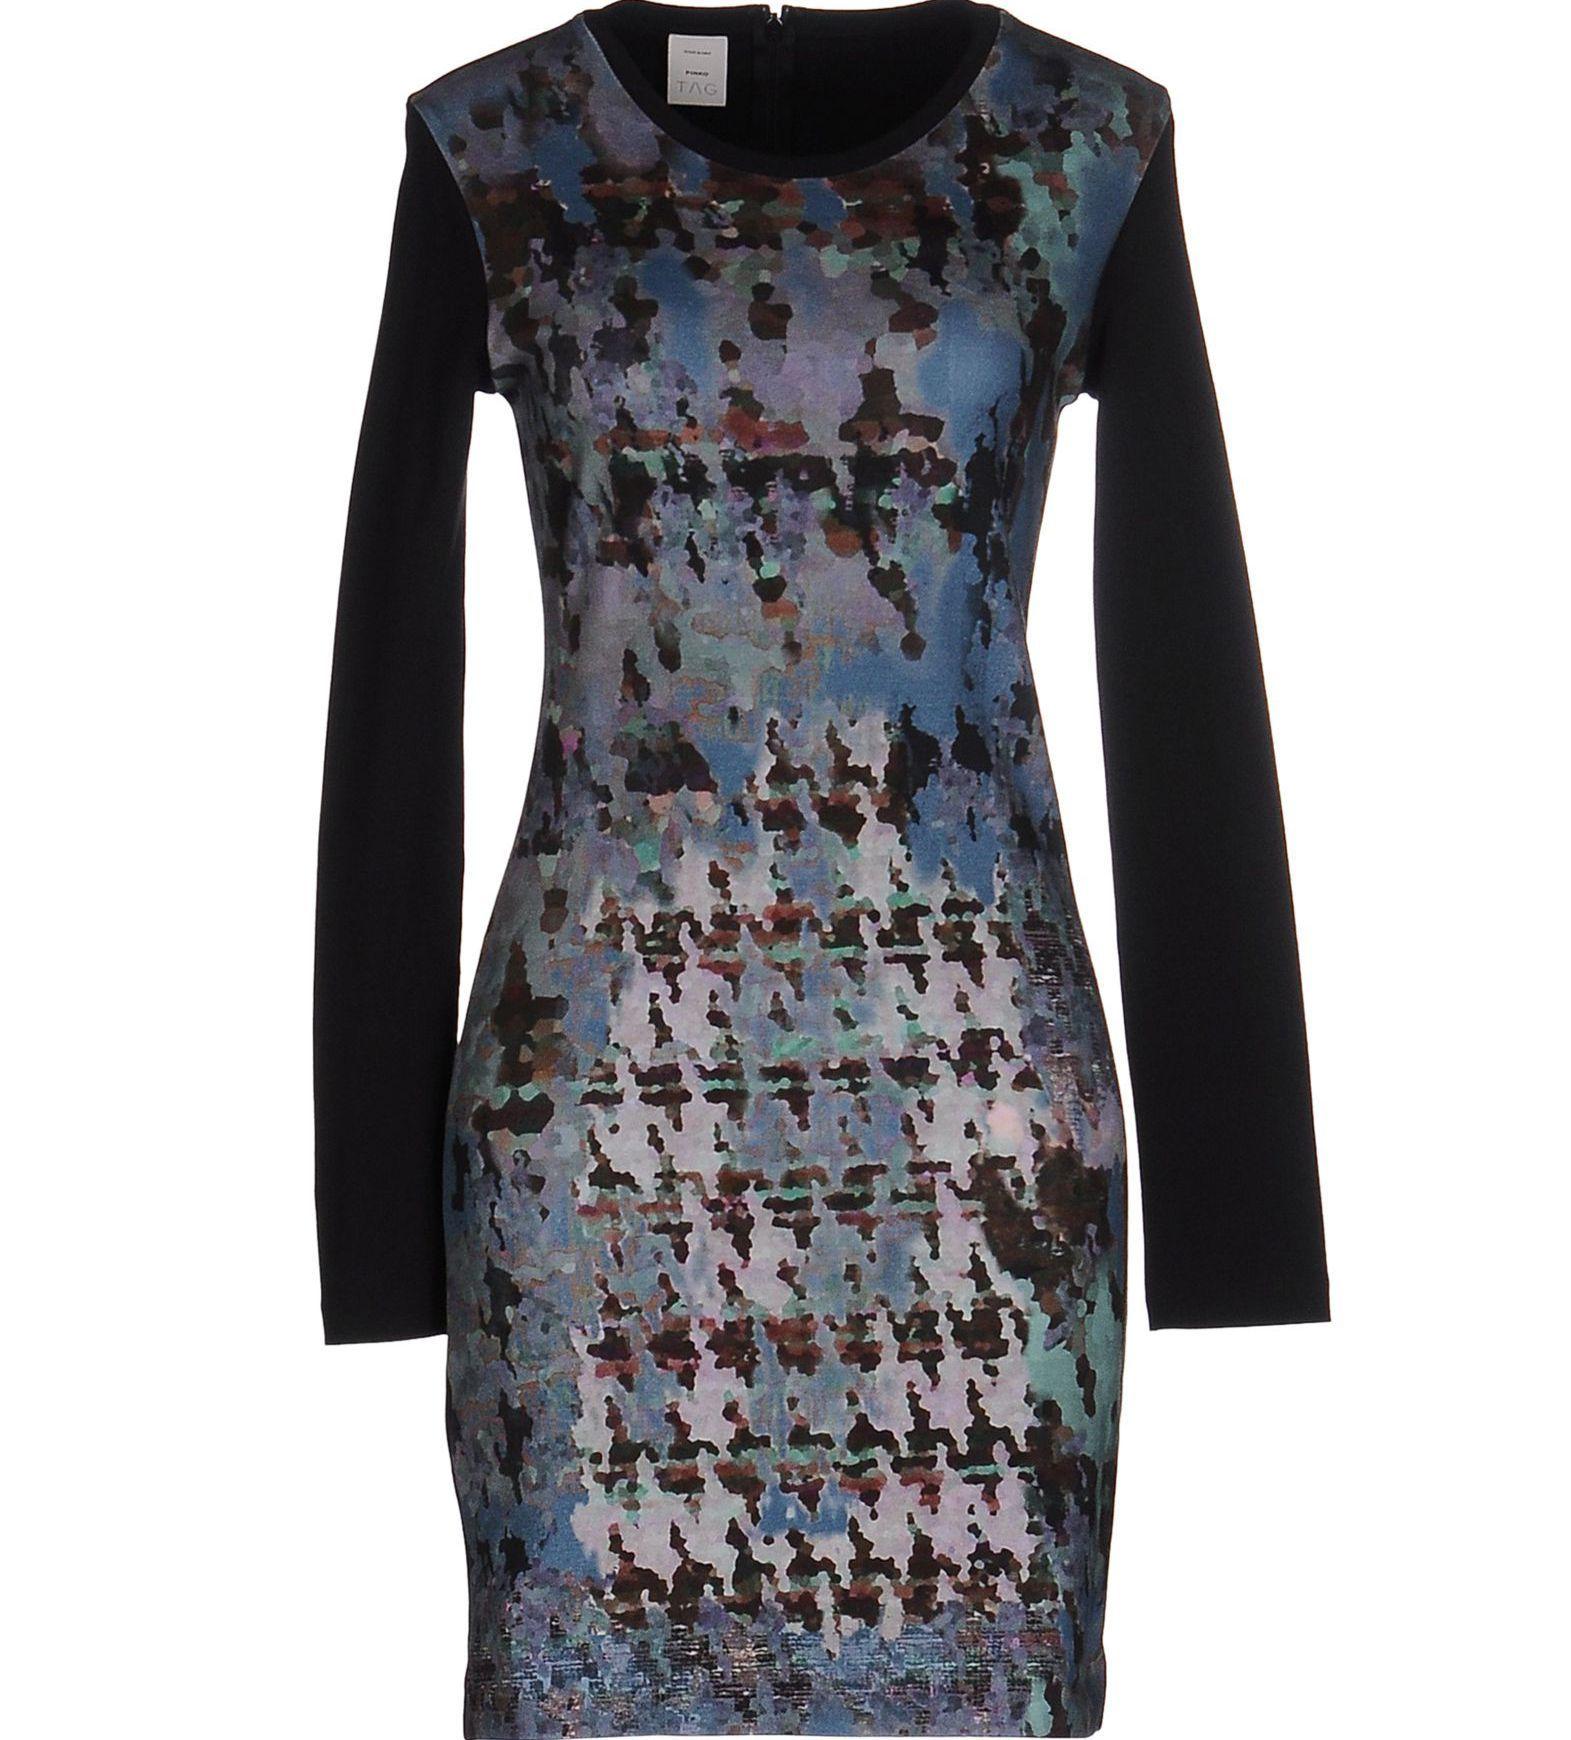 bfc79e51ec PINKO TAG ΦΟΡΕΜΑΤΑ Κοντό φόρεμα  moda  style  sales